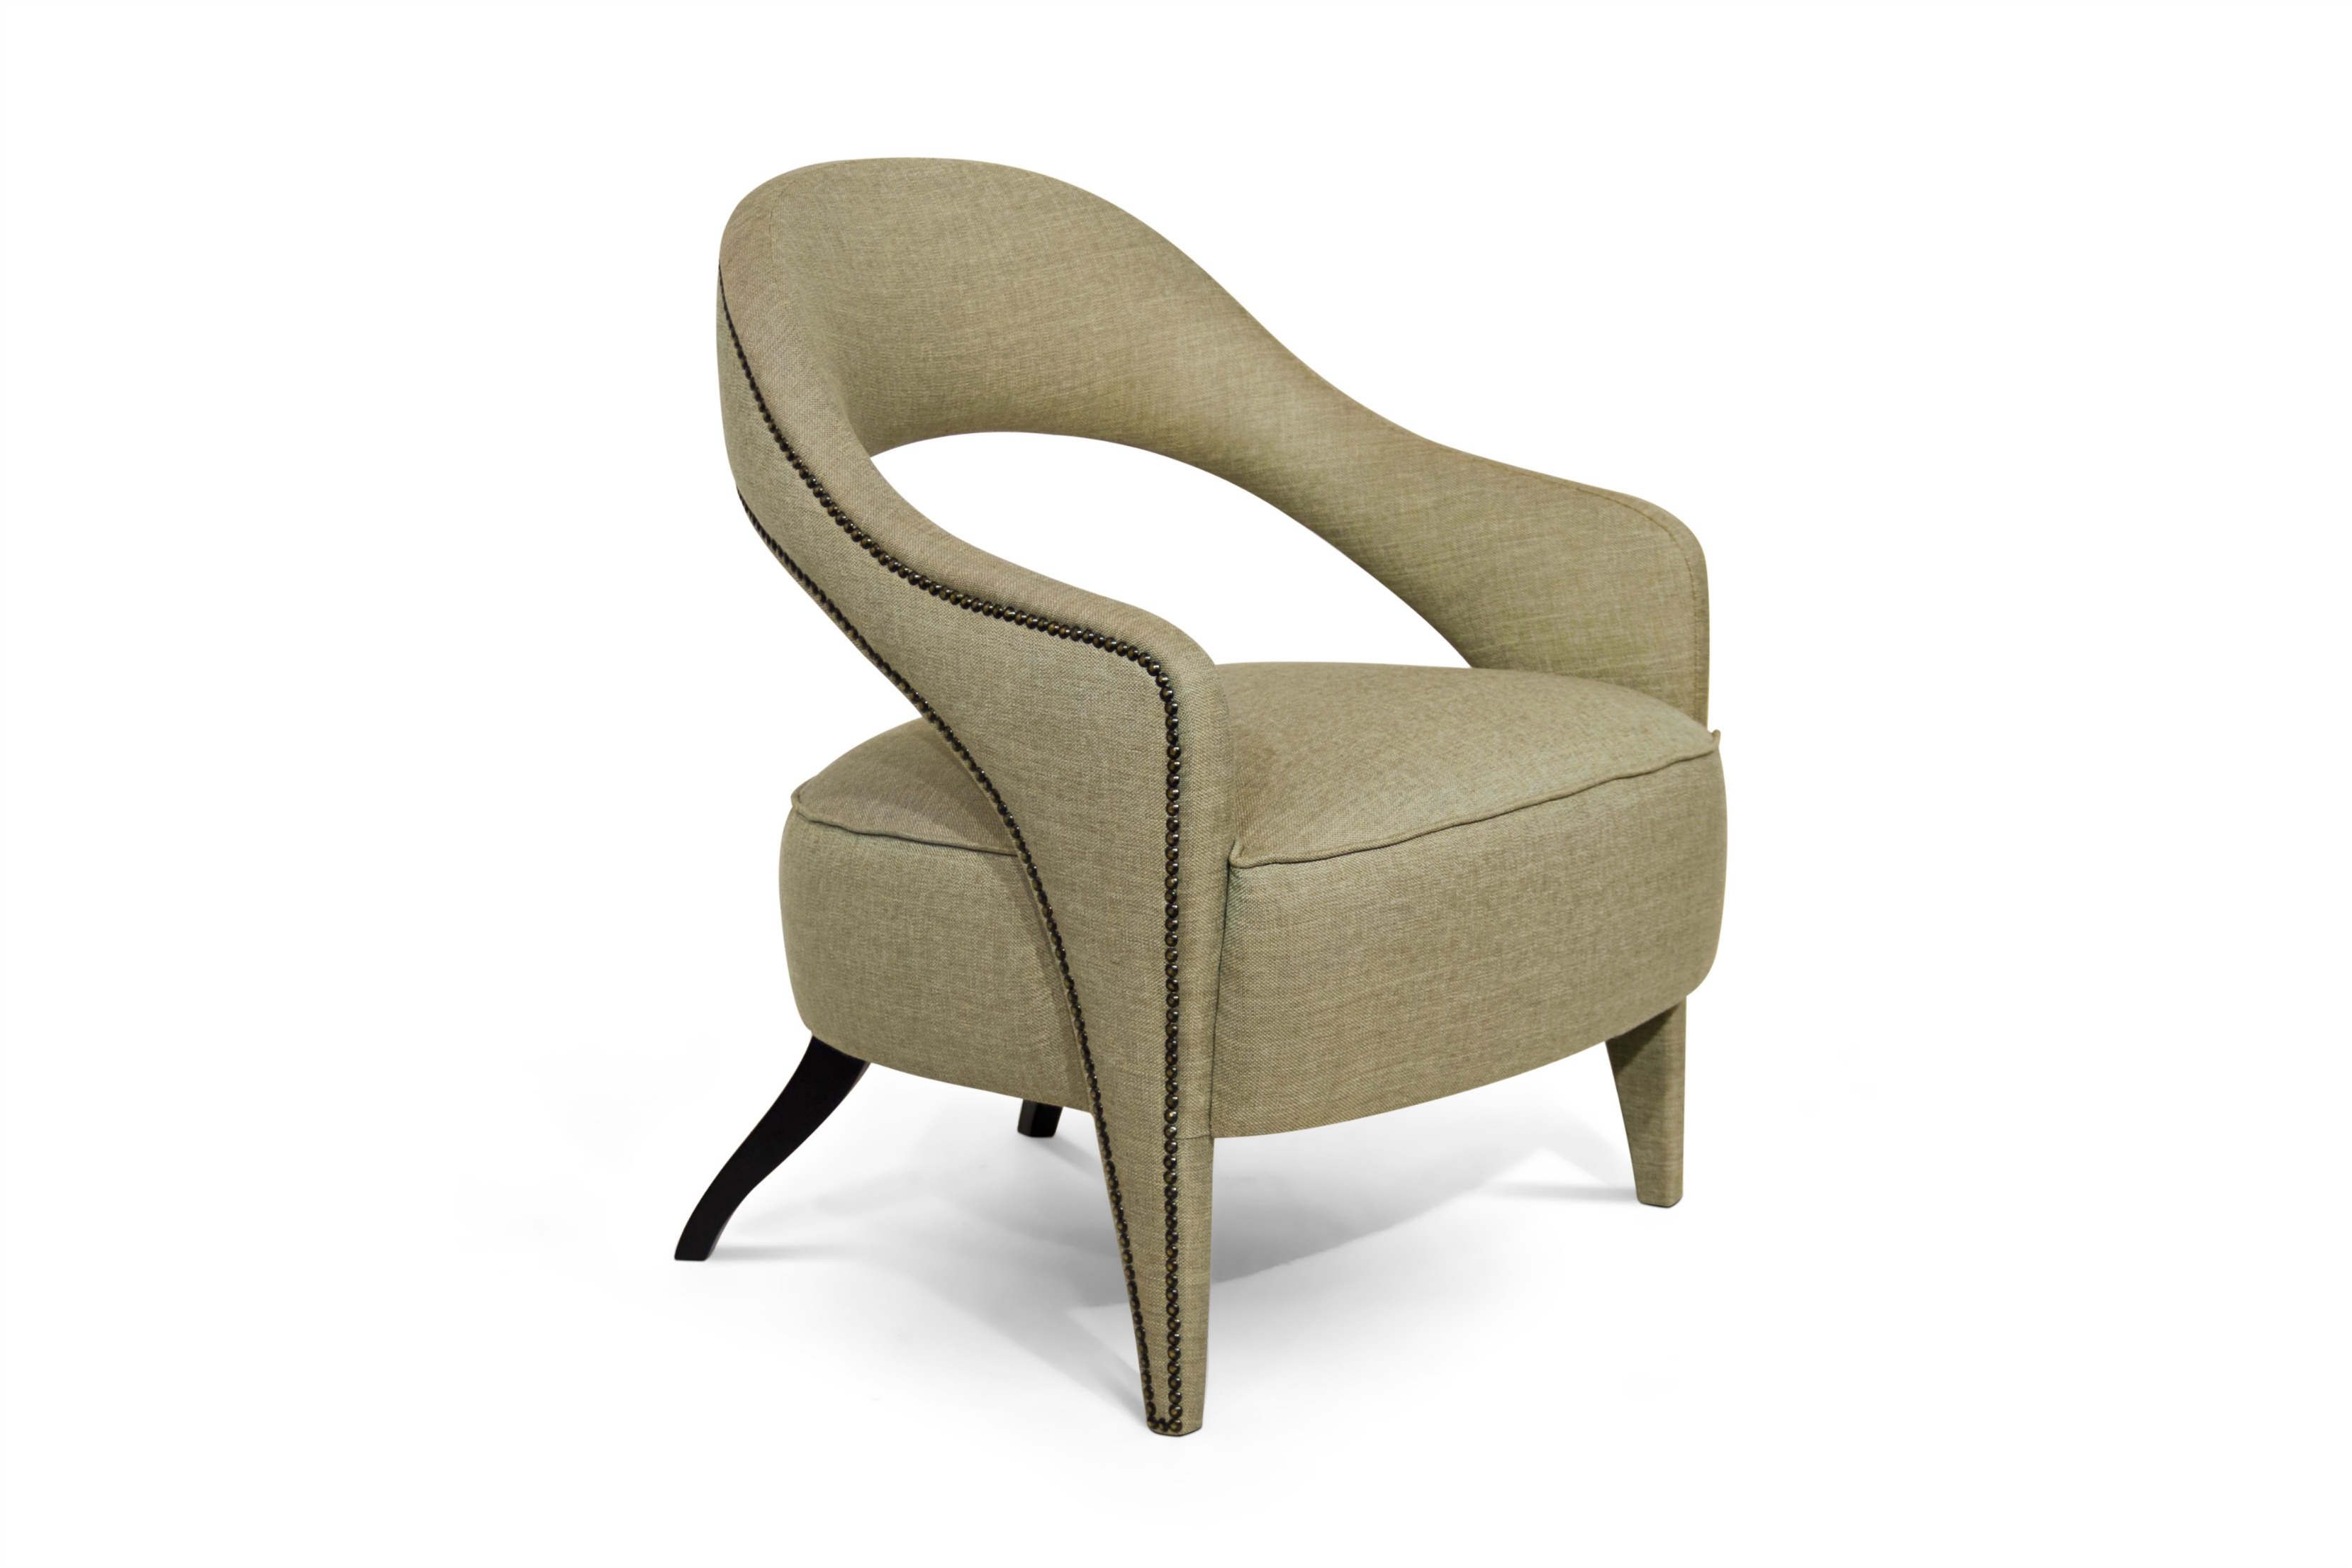 2020 interior design trends More 2020 Interior Design Trends: The Best New Ambiances tellus armchair 3 HR